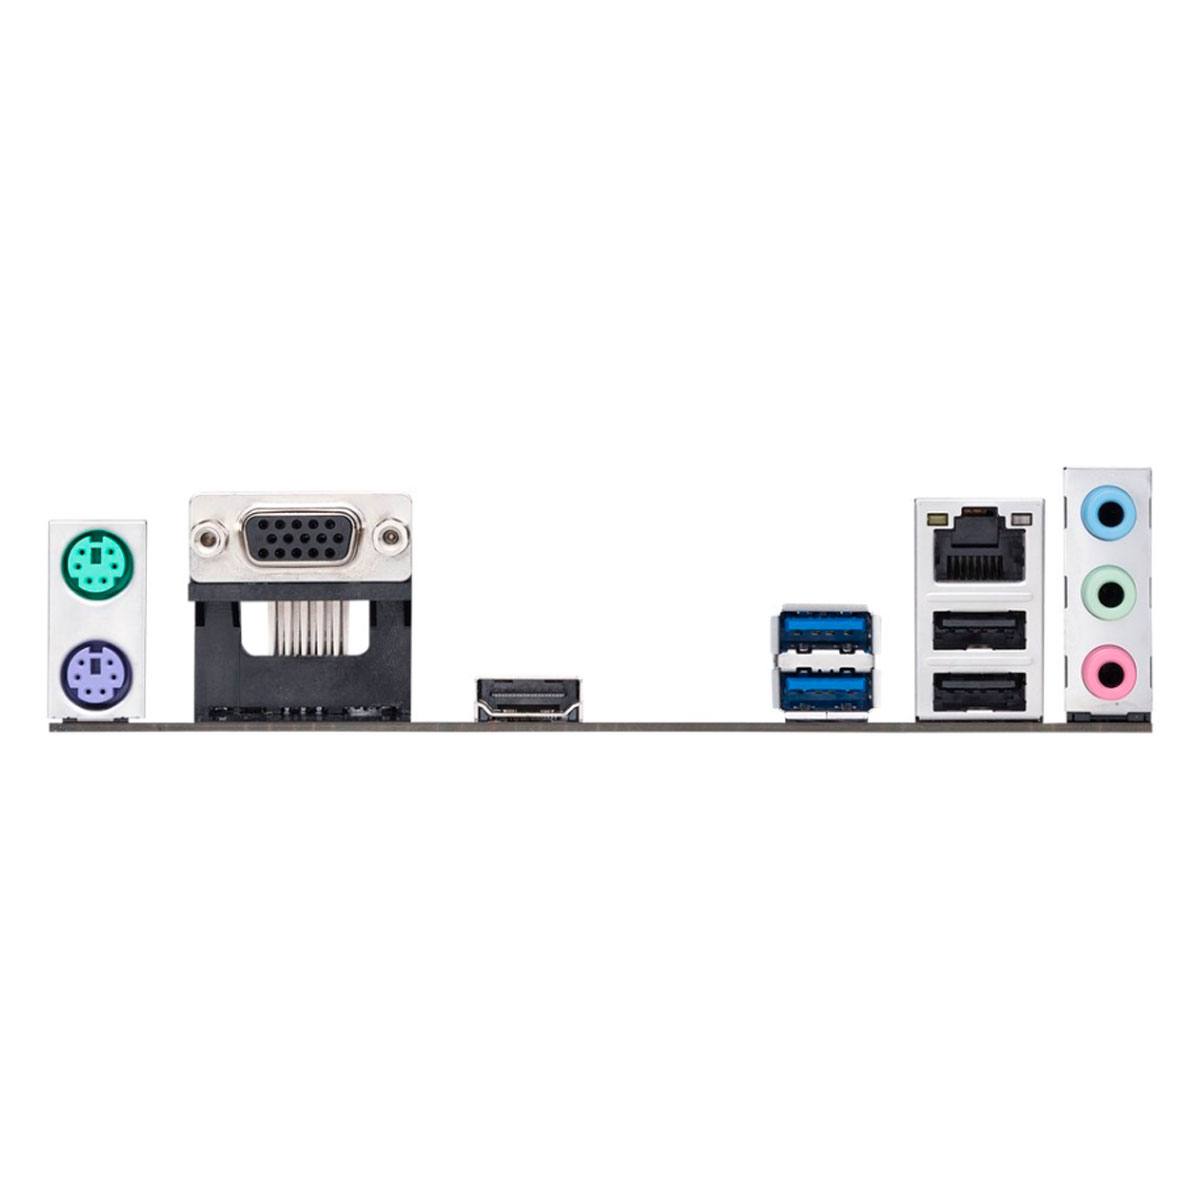 Kit Upgrade Optimize Plus, Asus Prime H410M-E, Intel Core I5-10400 2.9GHz, 8GB DDR4 2666MHz